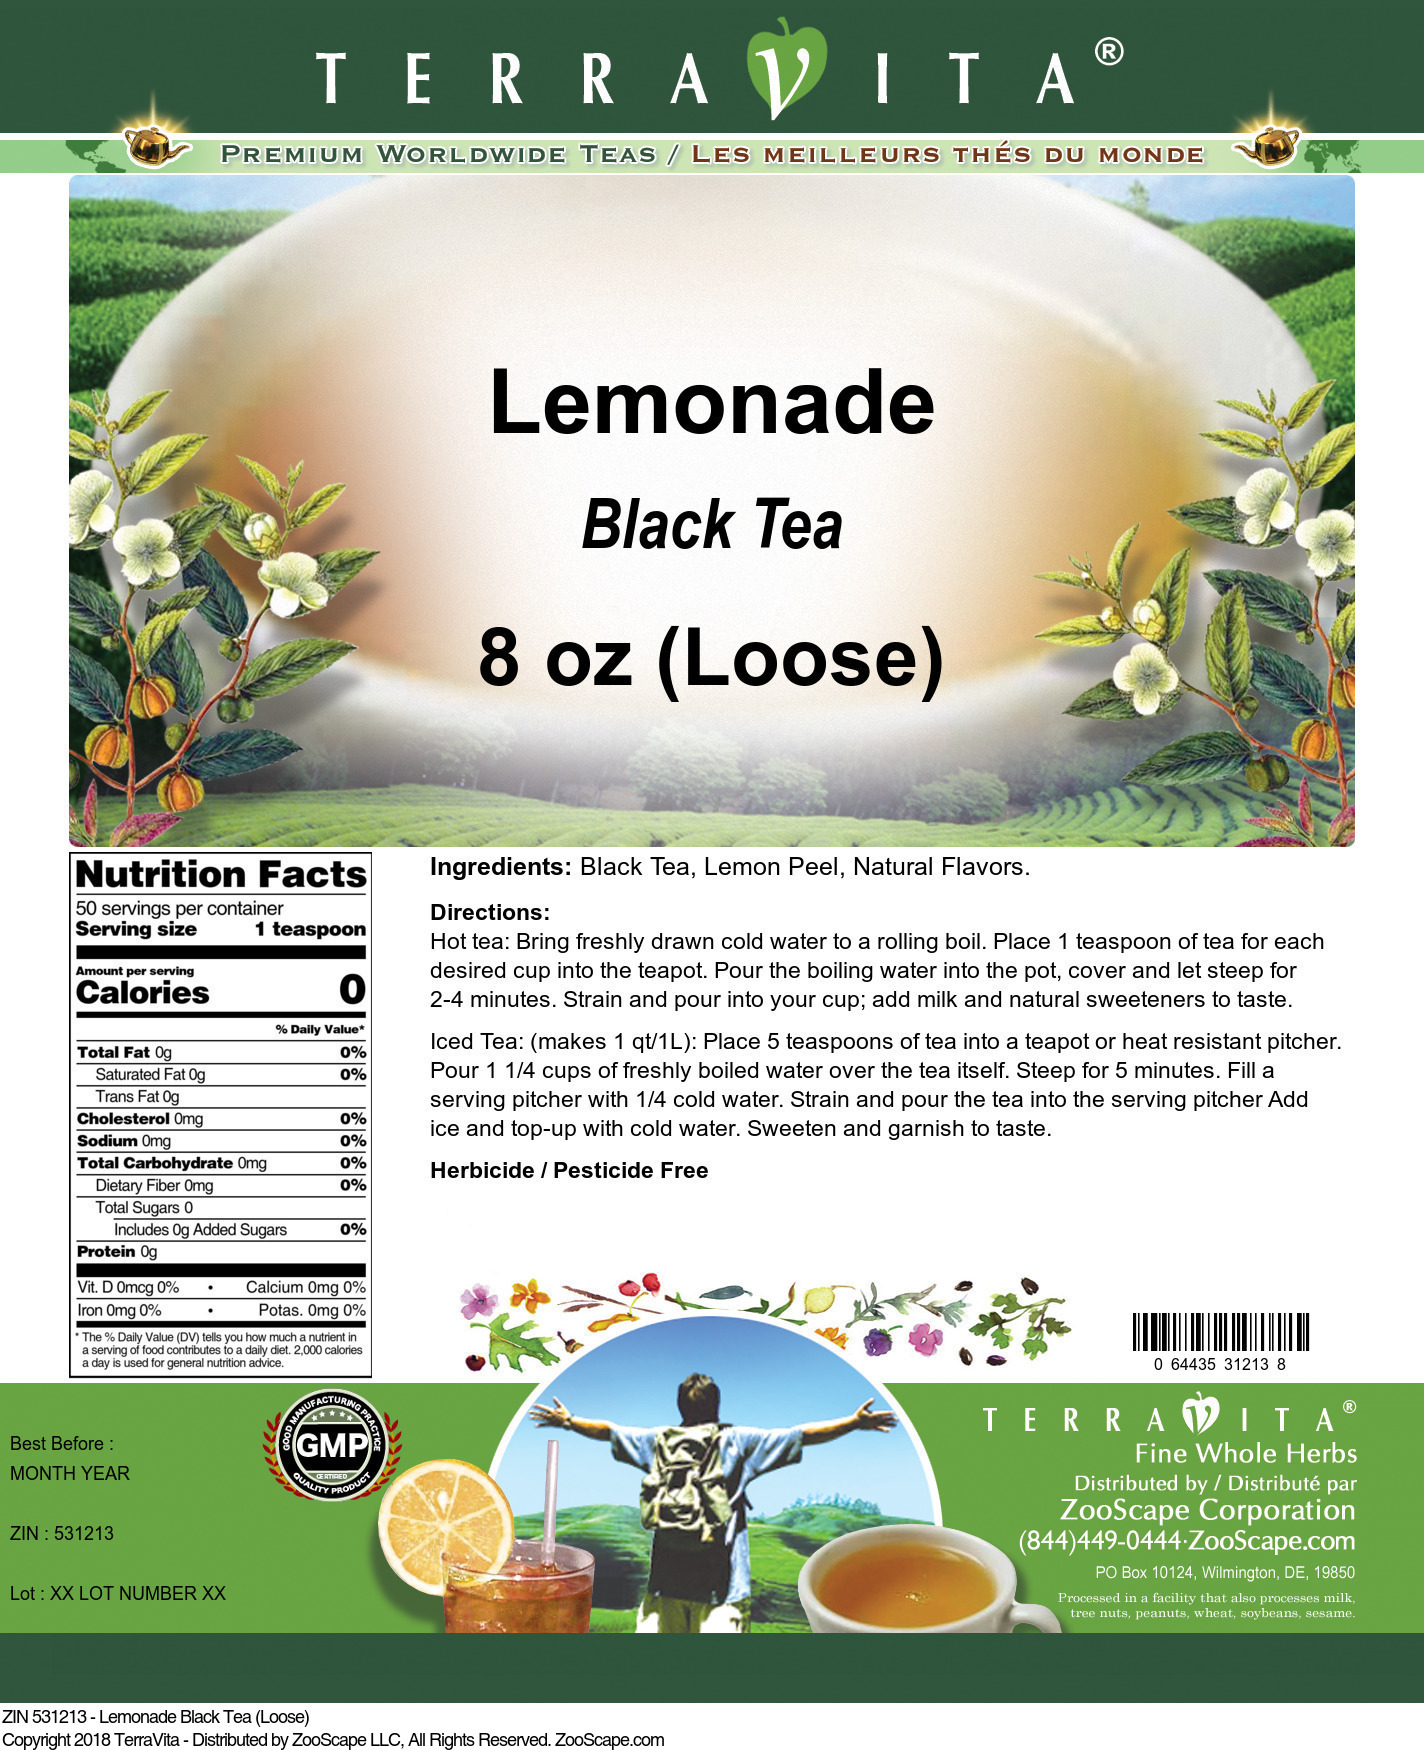 Lemonade Black Tea (Loose)